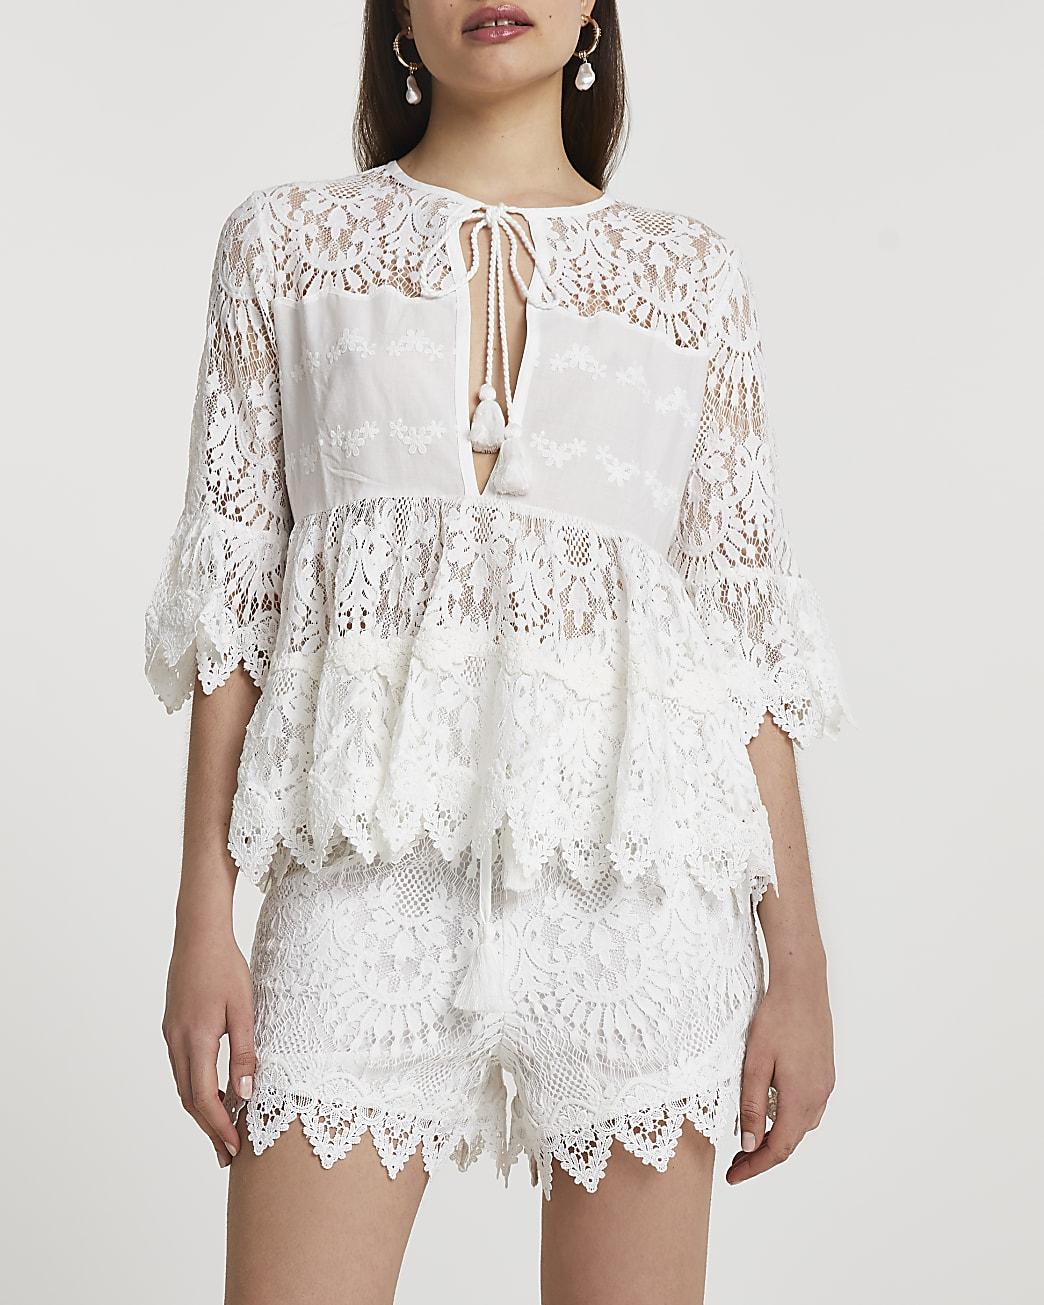 White lace tie front detail blouse